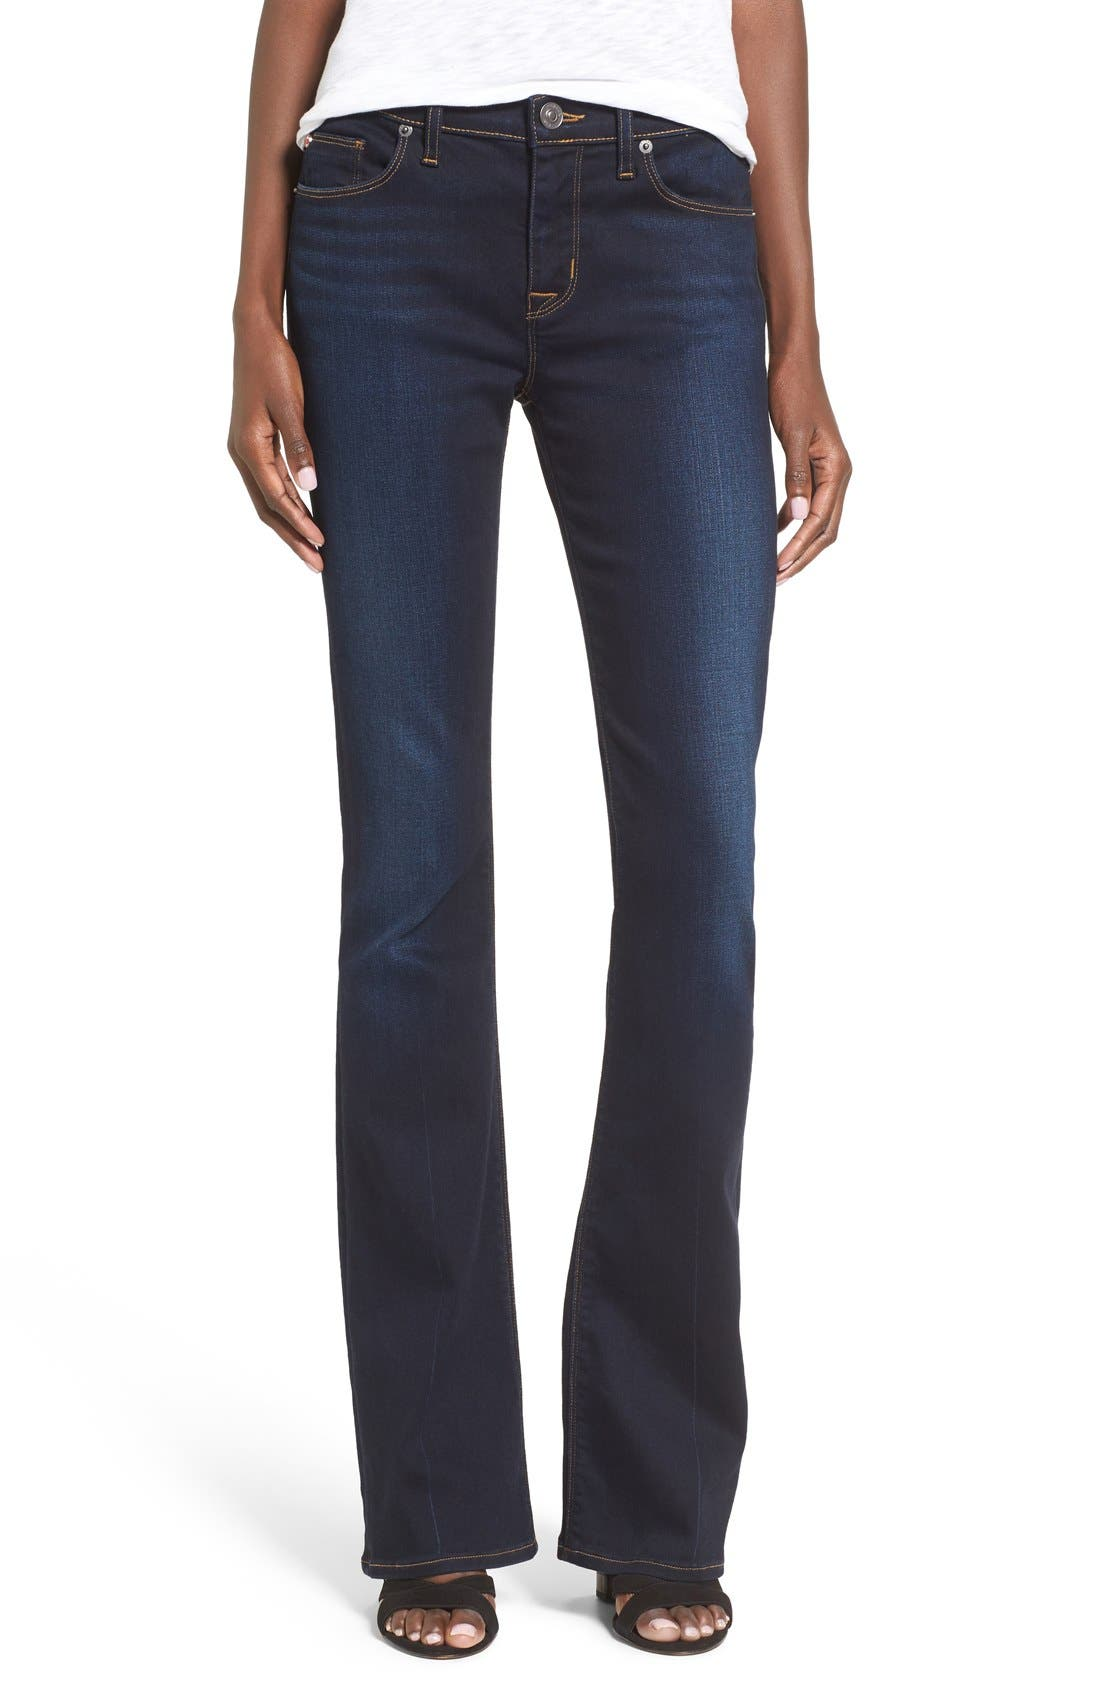 Main Image - Hudson Jeans 'Love' Bootcut Jeans (Redux) (Petite)